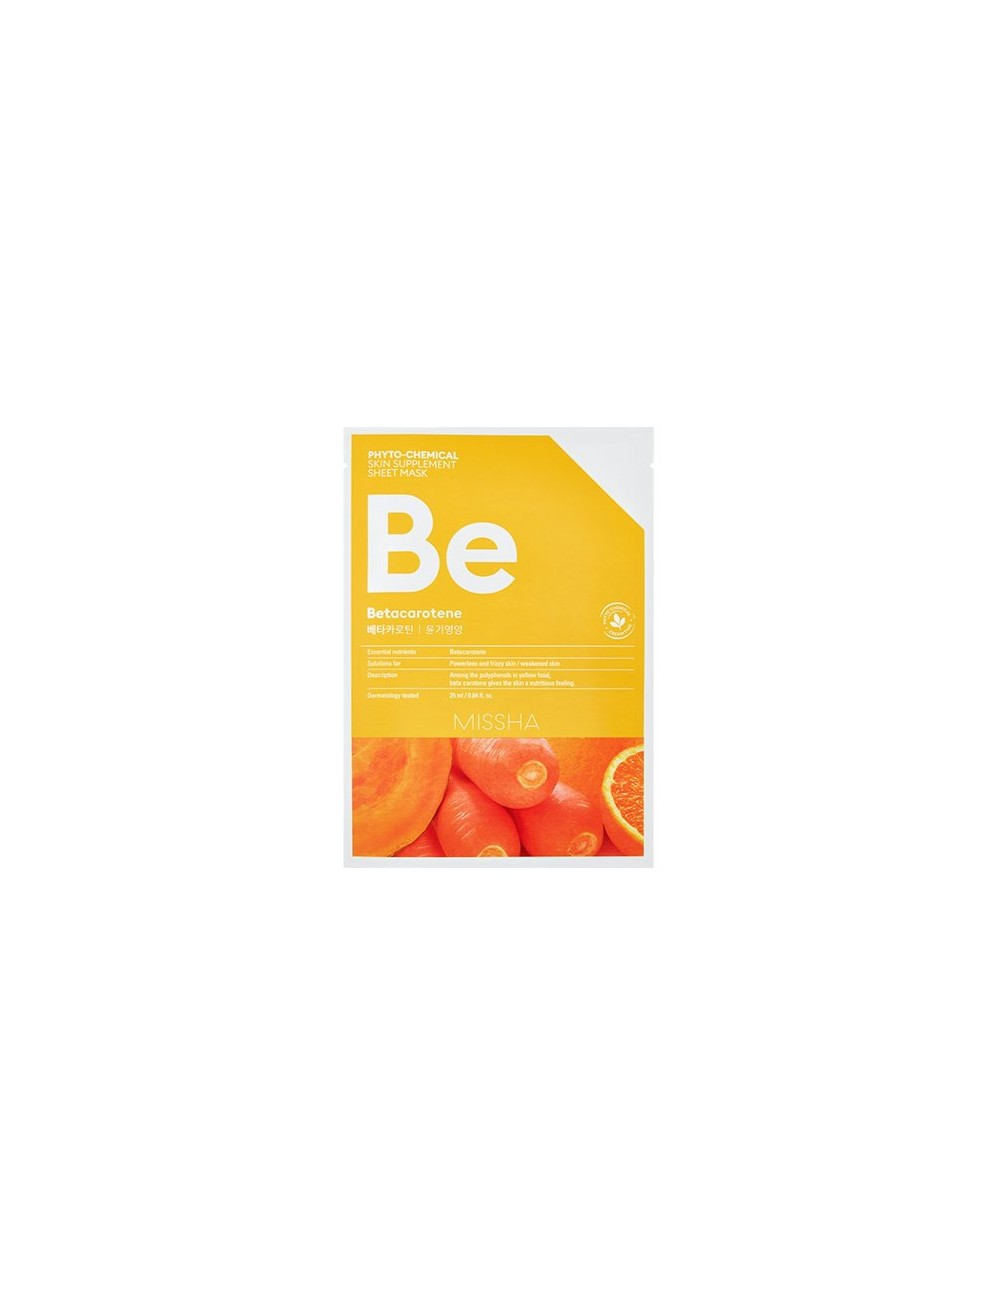 Mascarilla Iluminadora MISSHA Phyto-Chemical Skin Suplement Sheet Mask Betacarotene